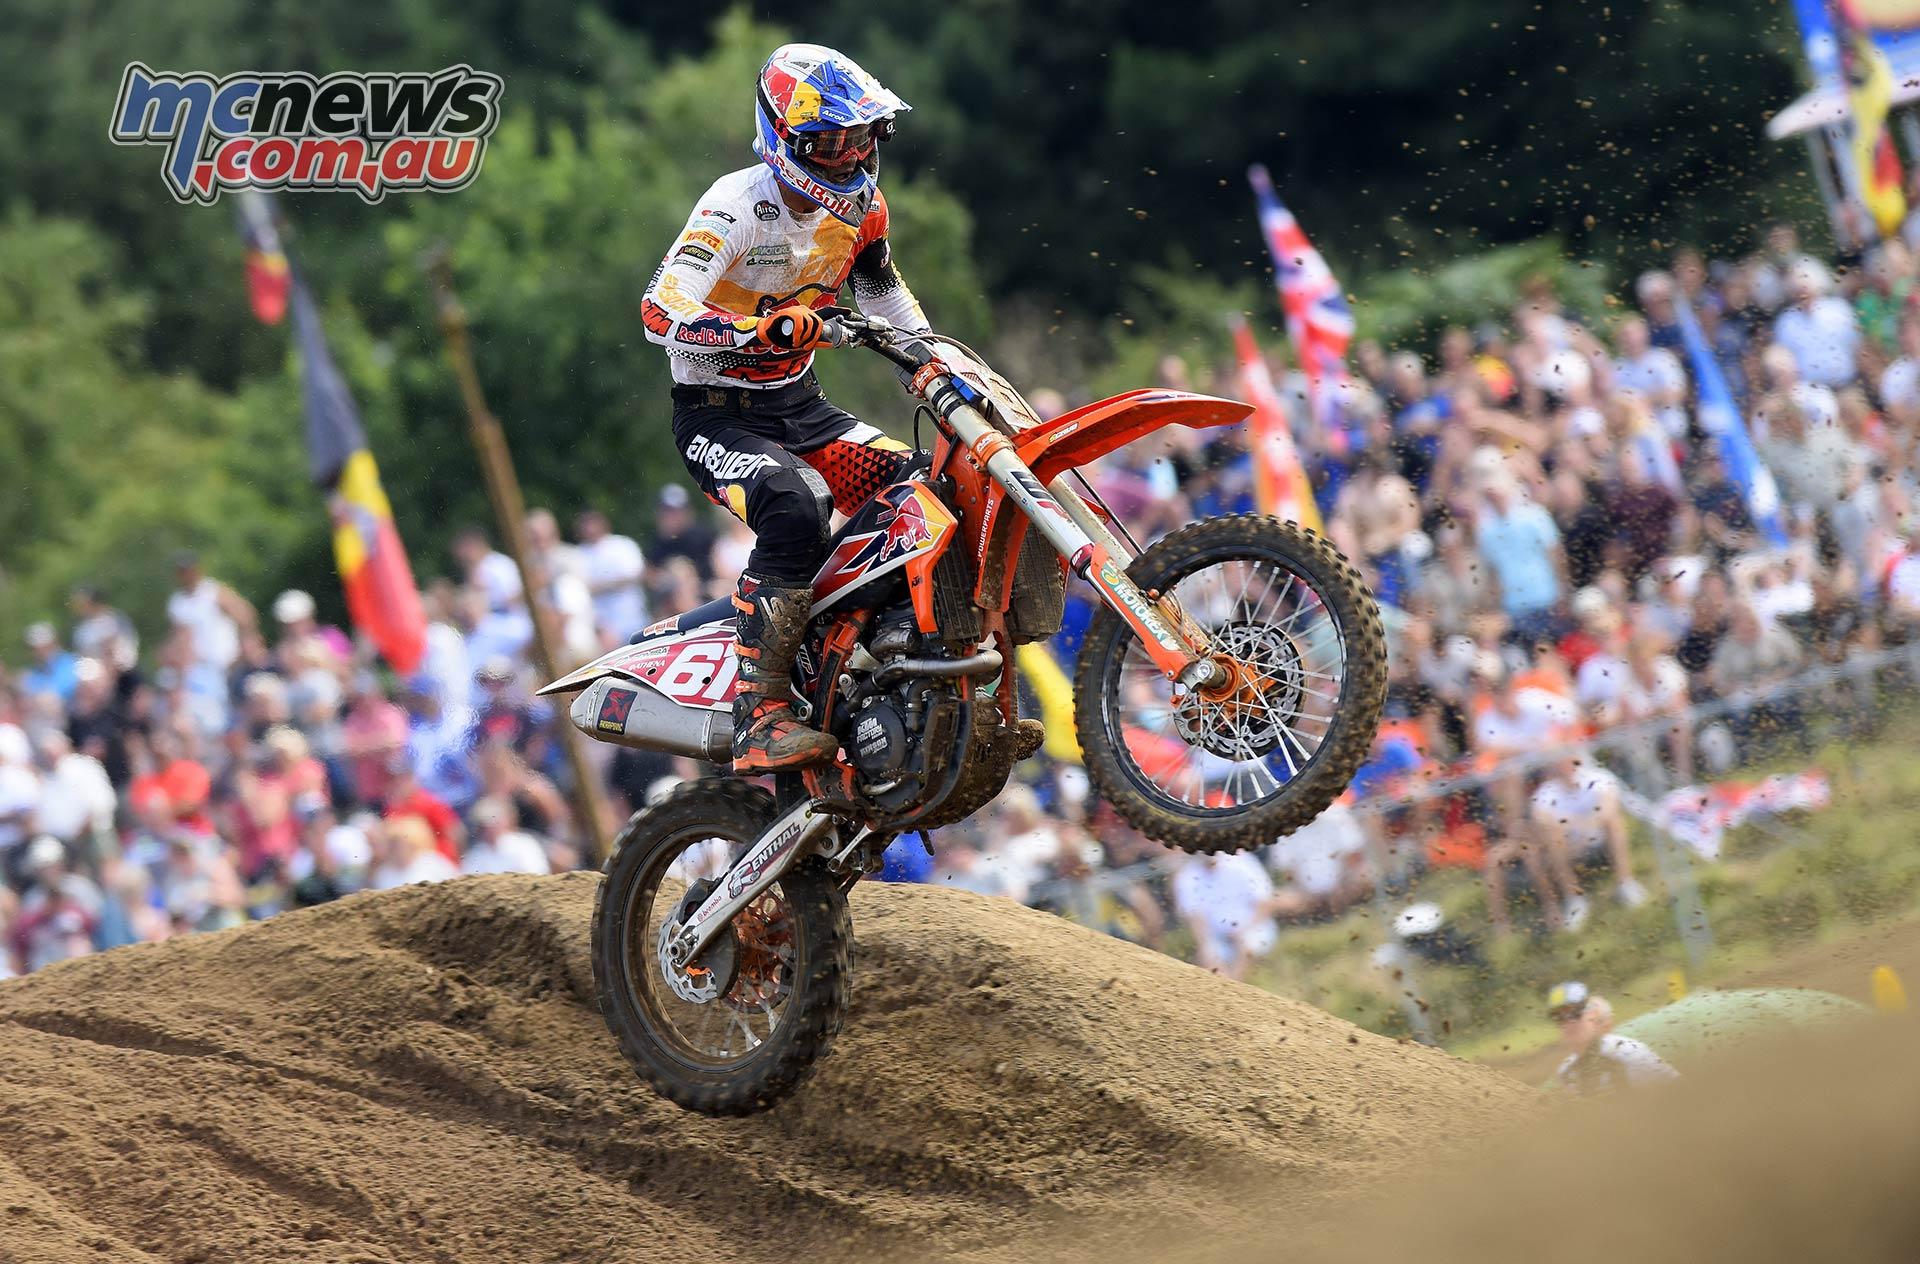 MXGP Rnd Belgium Pirelli MX Prado action